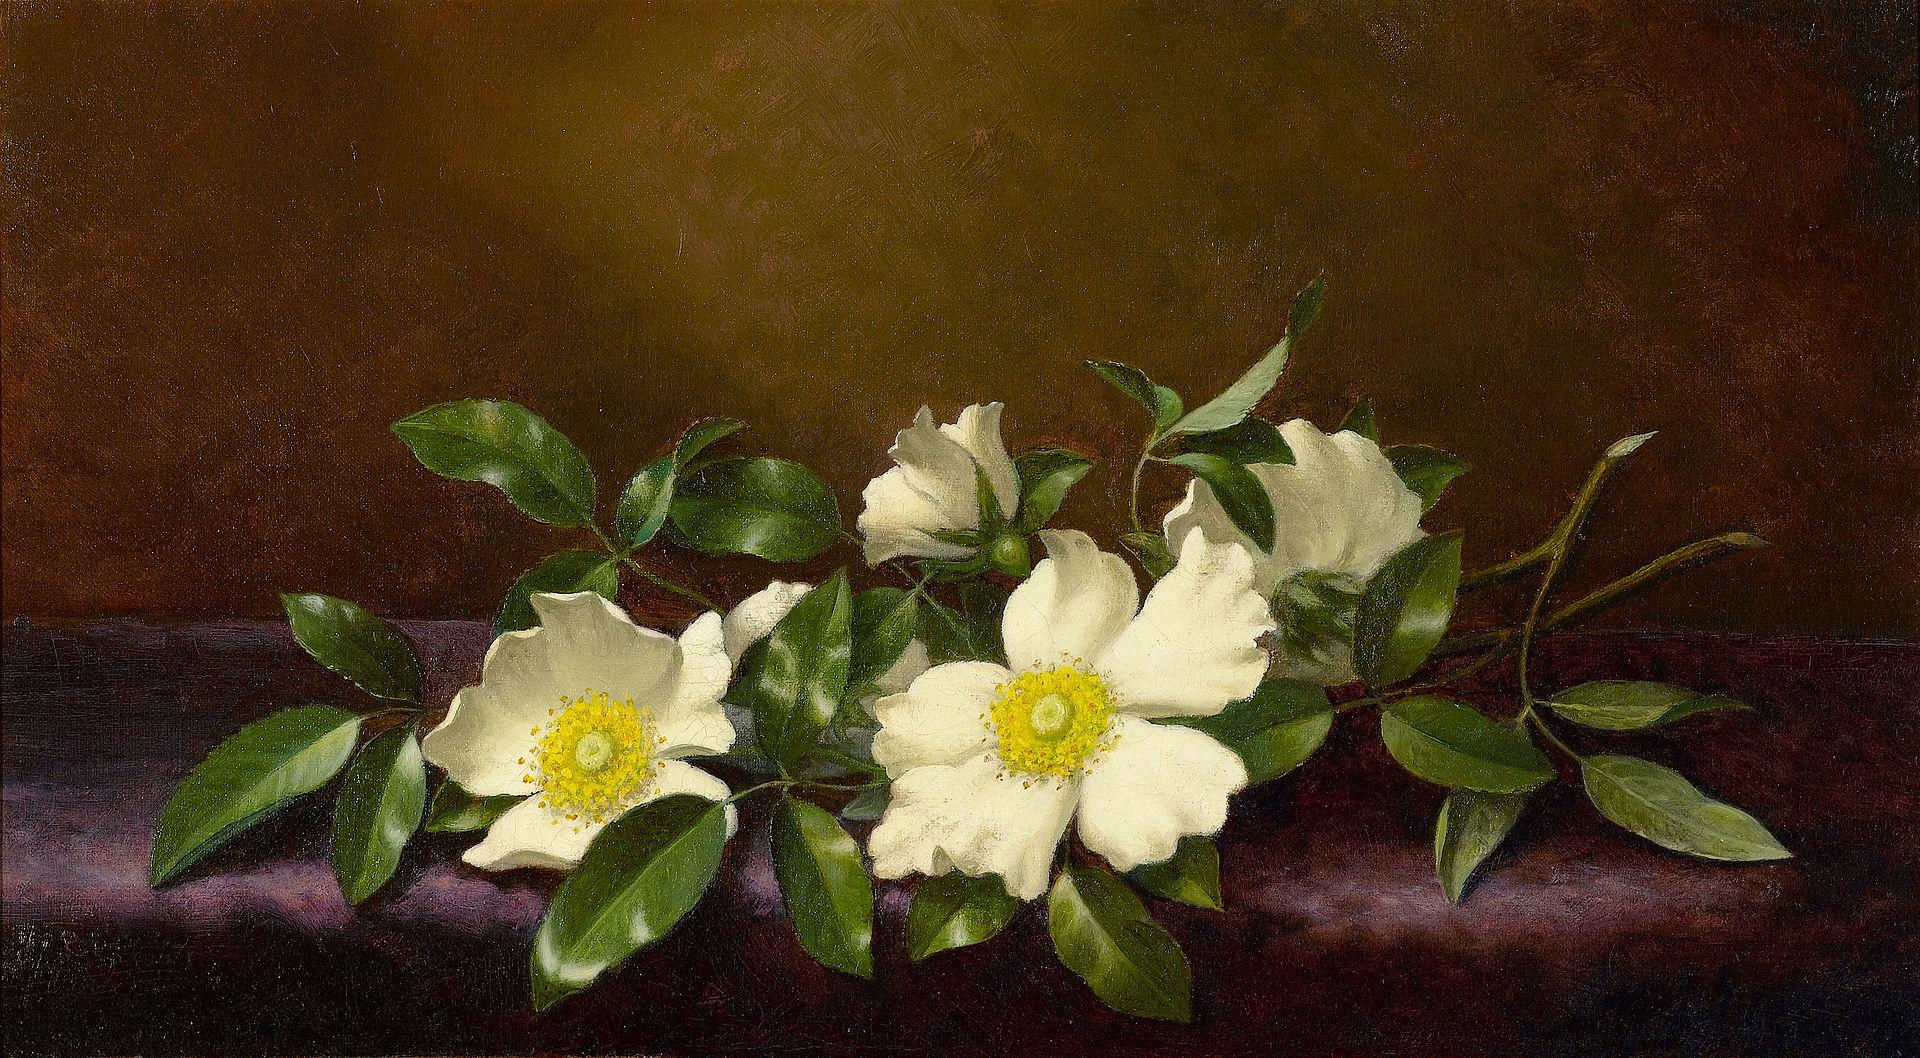 Розы Чероки на пурпурной ткани-Мартин Джонсон Heade-1894.jpg